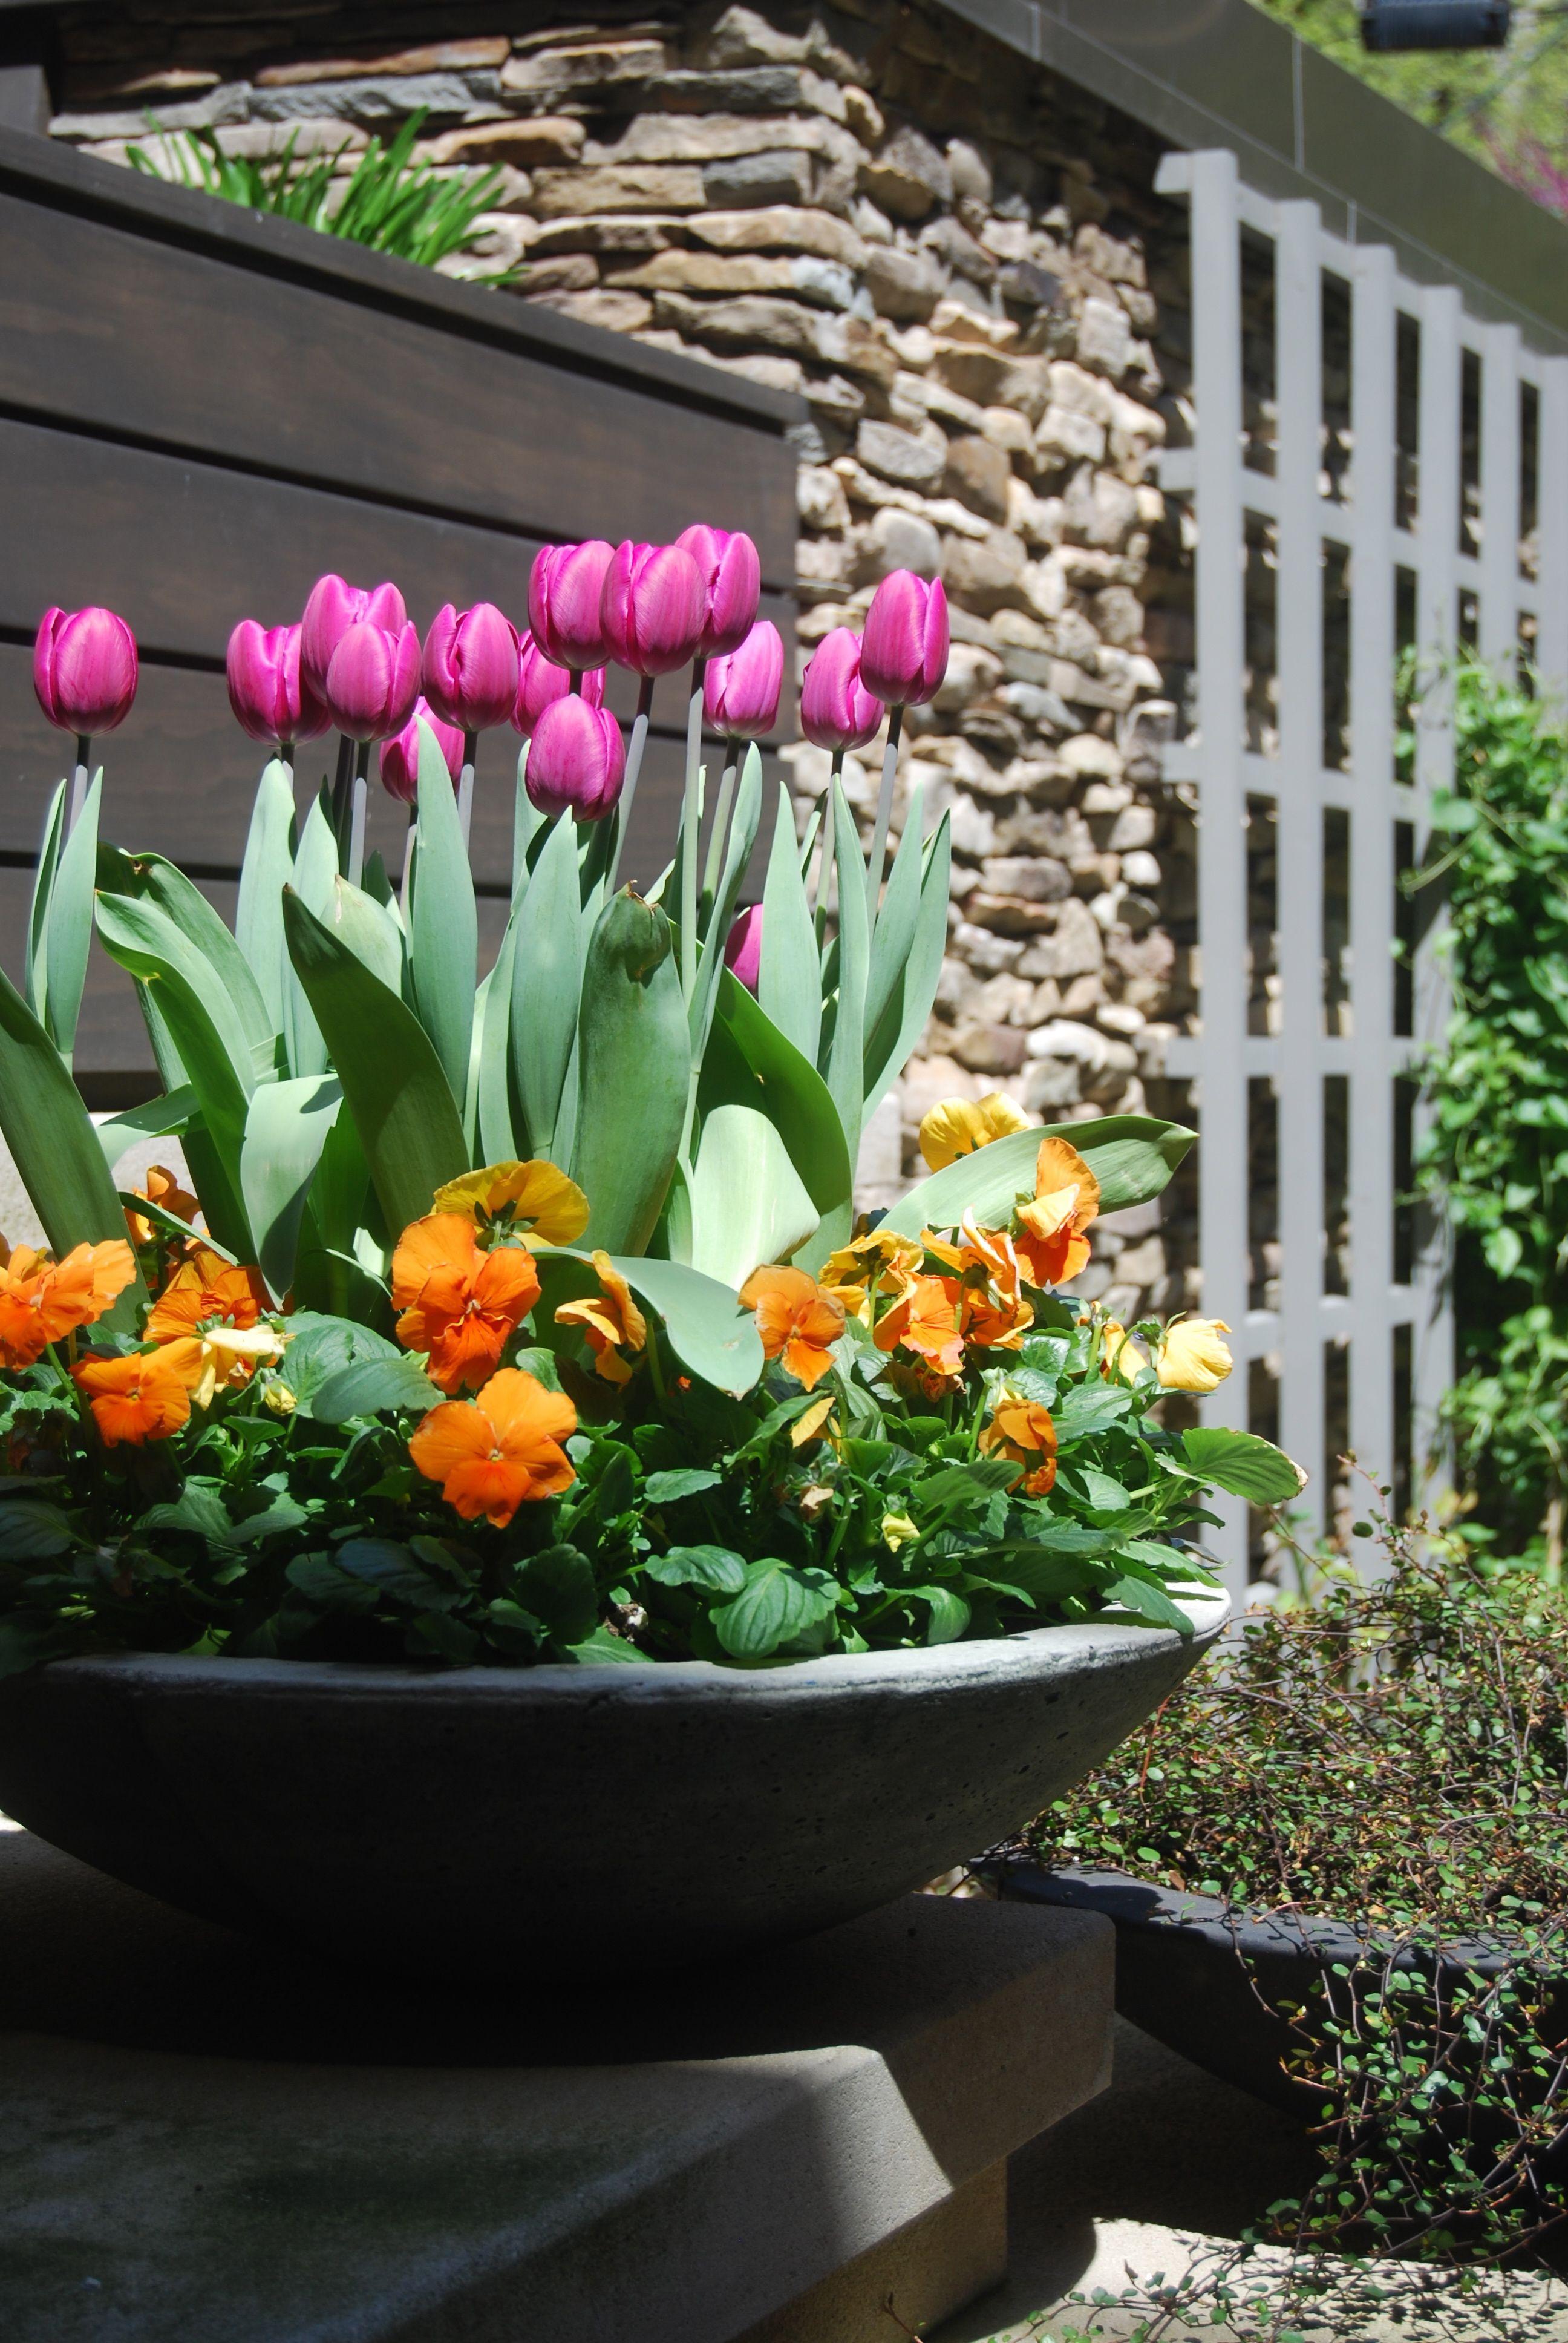 Spring Annuals Flowers Pansies Tulips Urban Garden Landscape Design Planting Tulips Tulips Garden Spring Planter